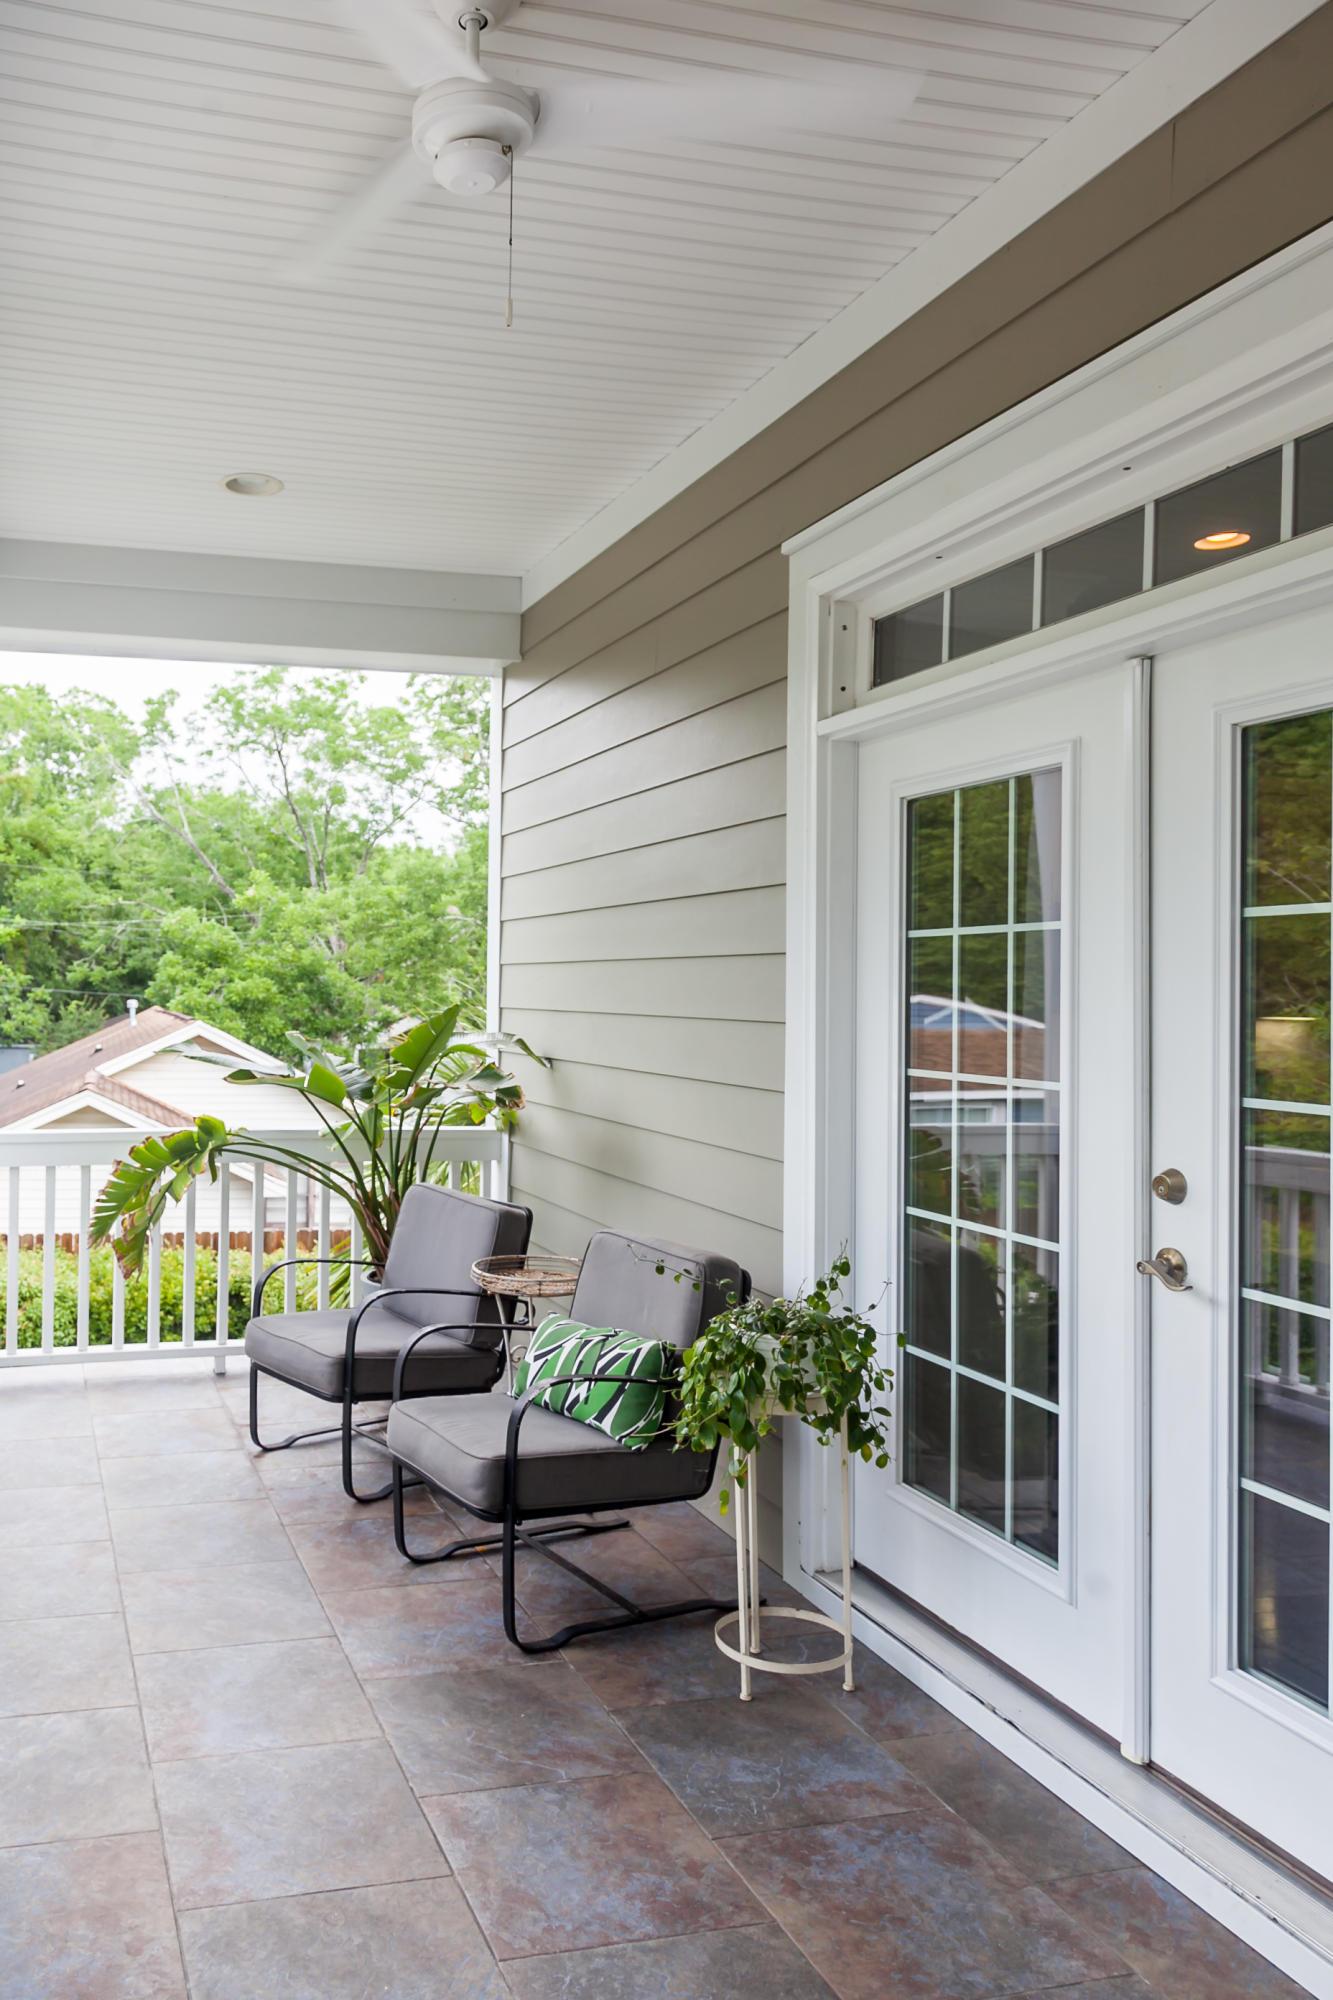 Whitesides Park Homes For Sale - 1319 Myrick, Mount Pleasant, SC - 42